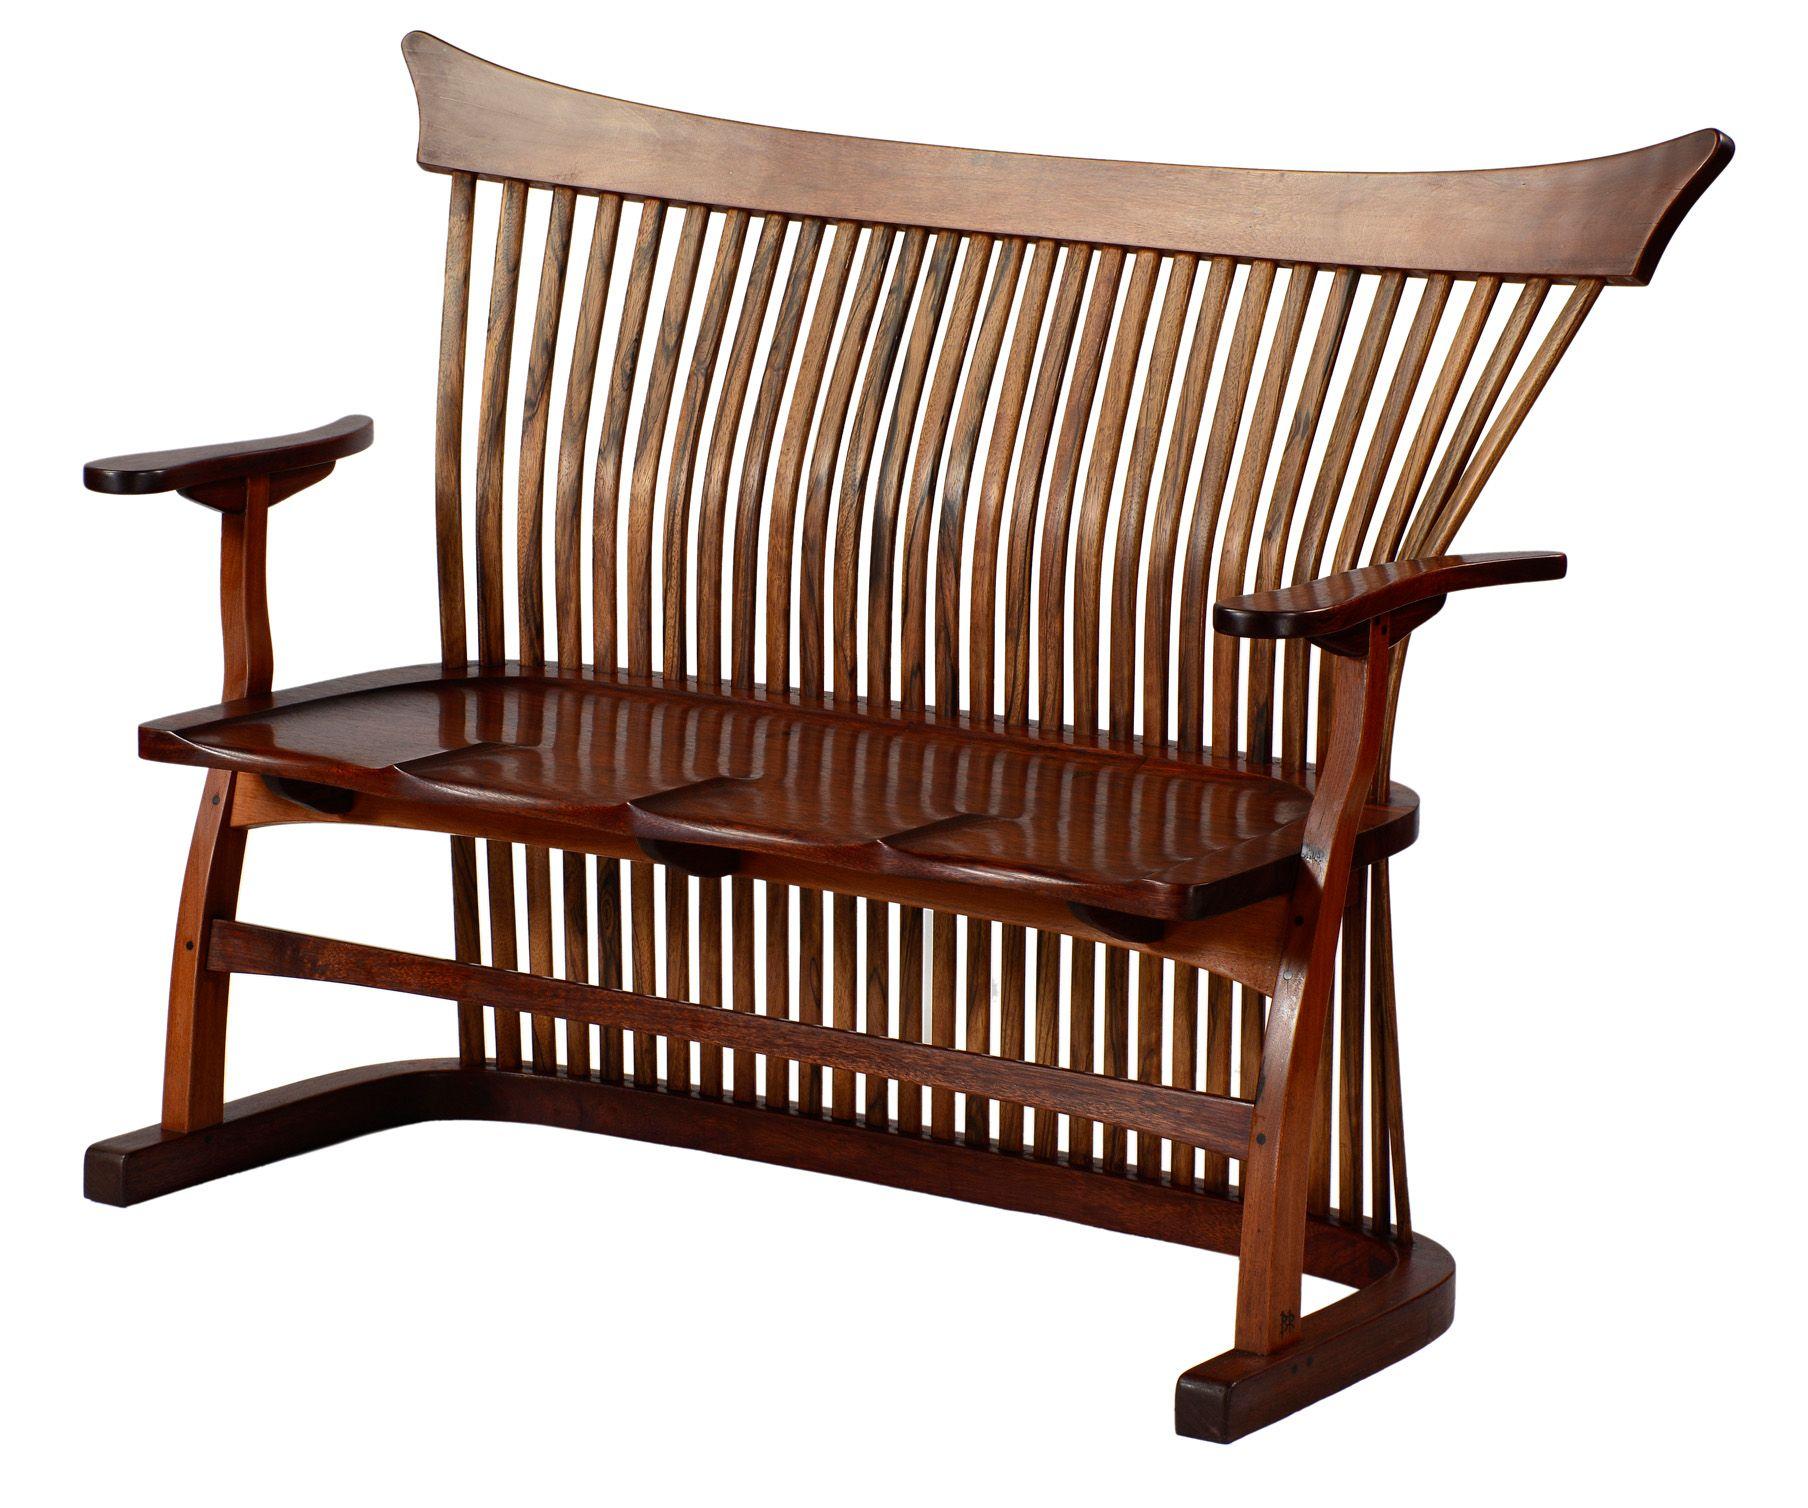 sofa furniture for sale in the philippines restoration hardware lancaster manufacturer lola basyang bench benji reyes home pinterest